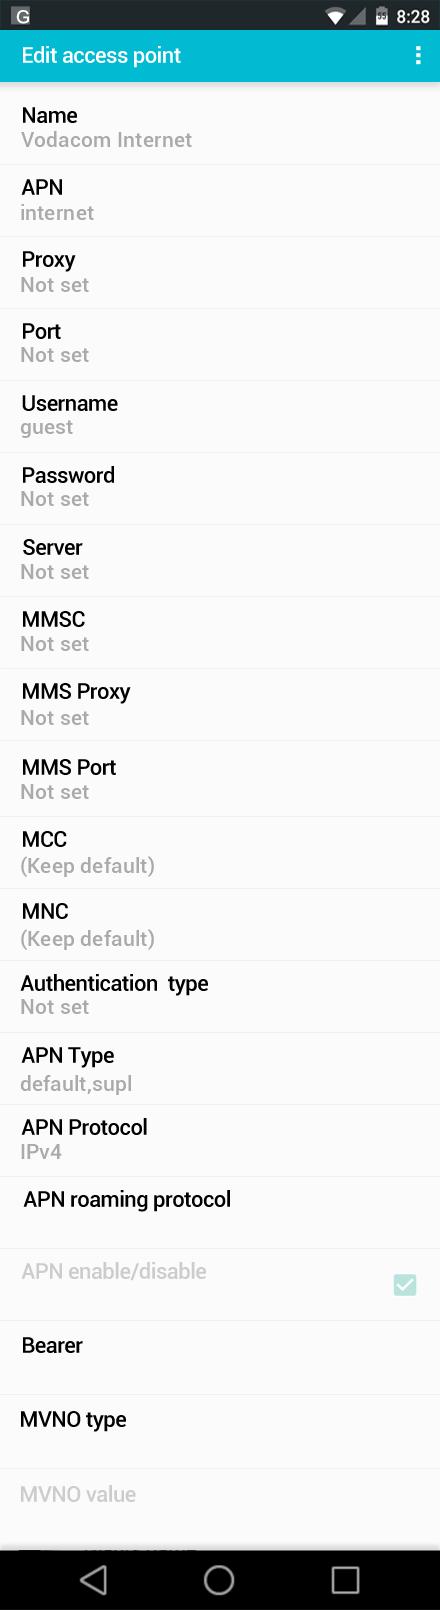 Vodacom Internet APN settings for Android